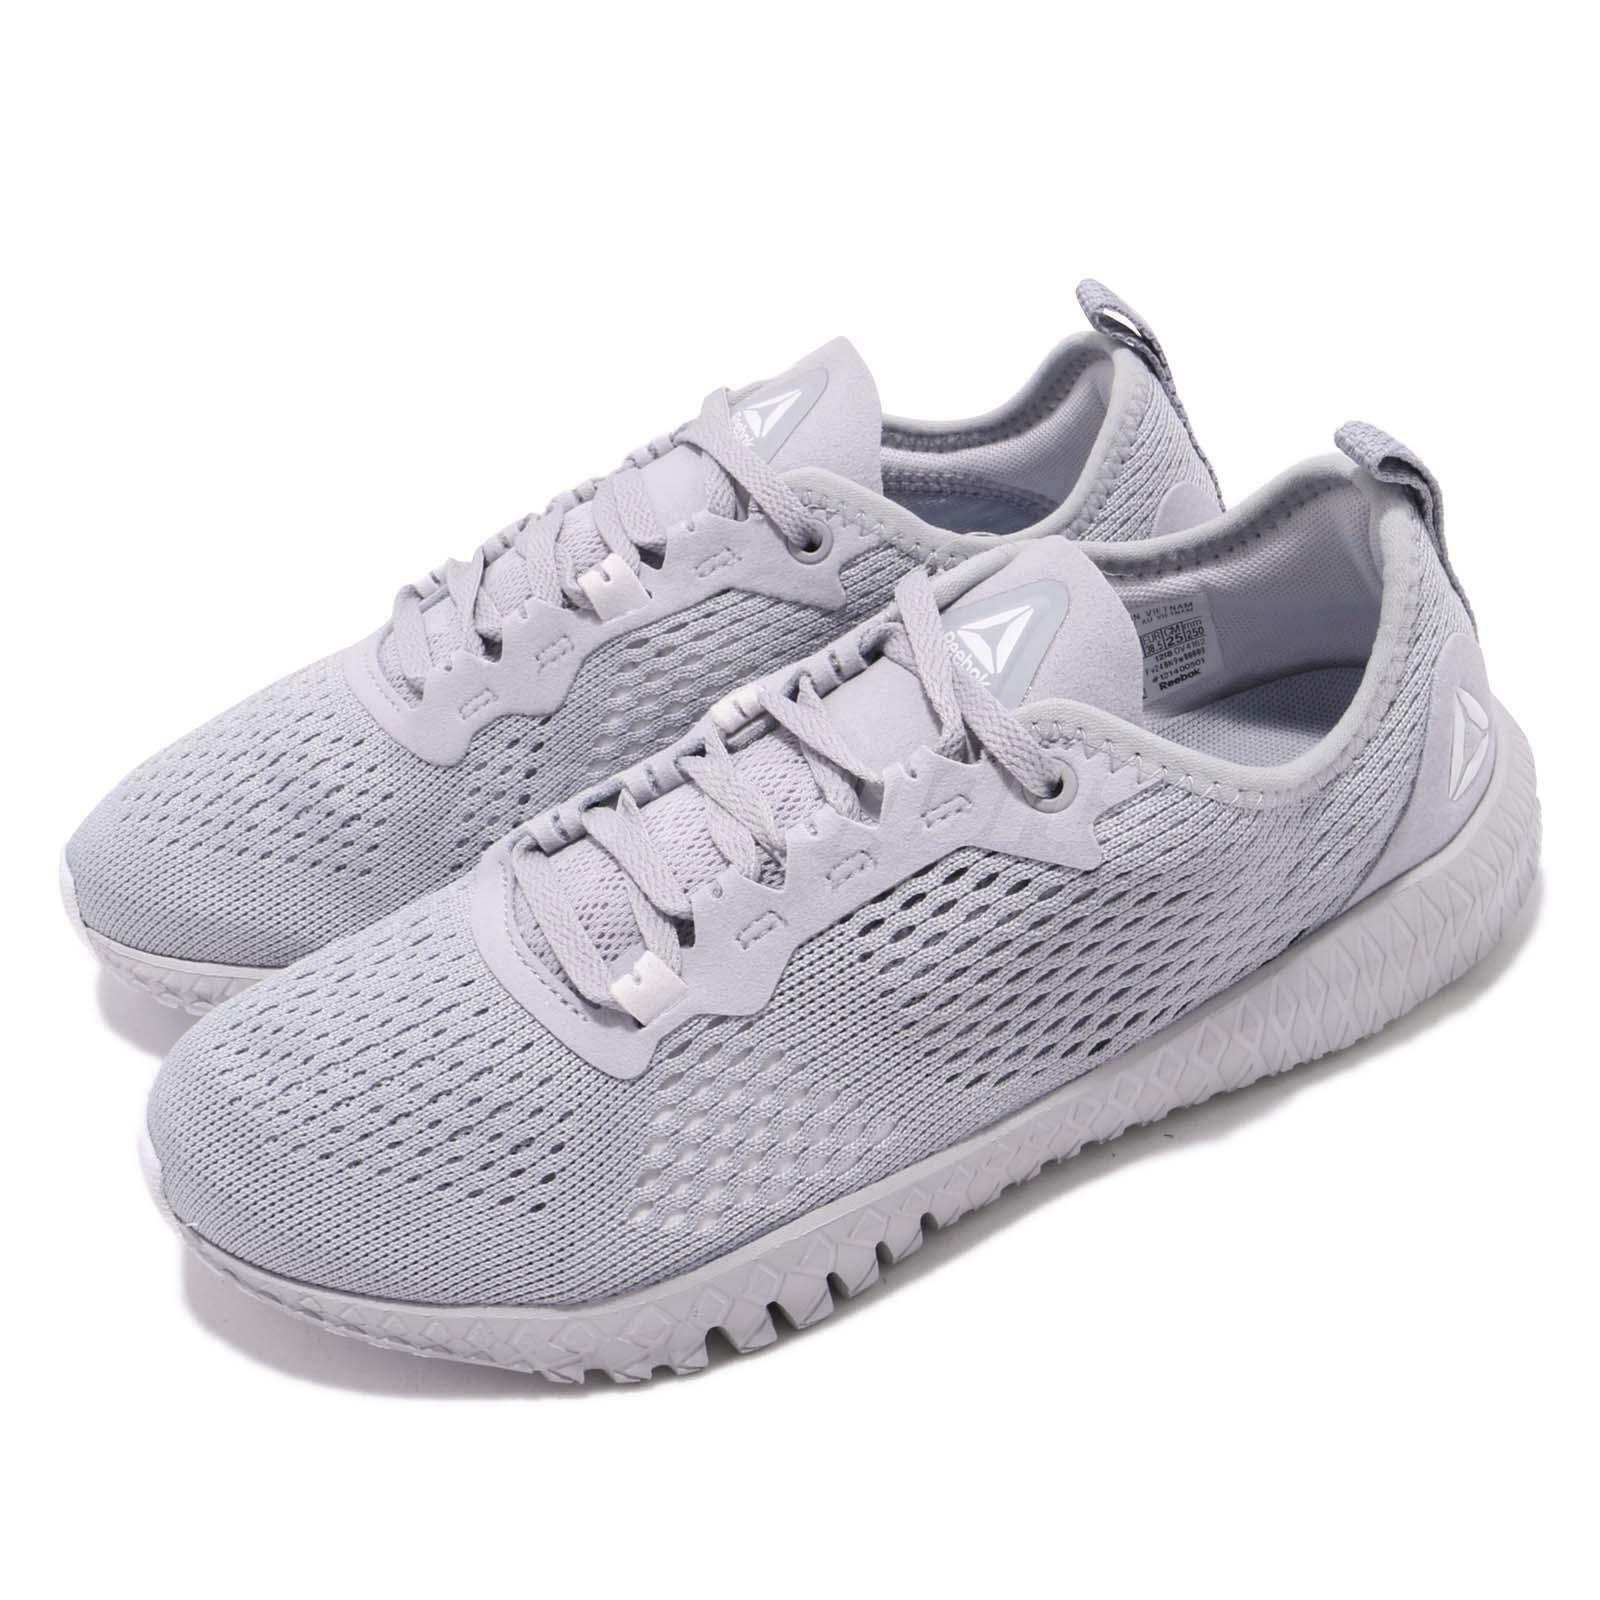 Reebok Flexagon grigio bianca donna Workout Cross Training scarpe scarpe da ginnastica DV4162